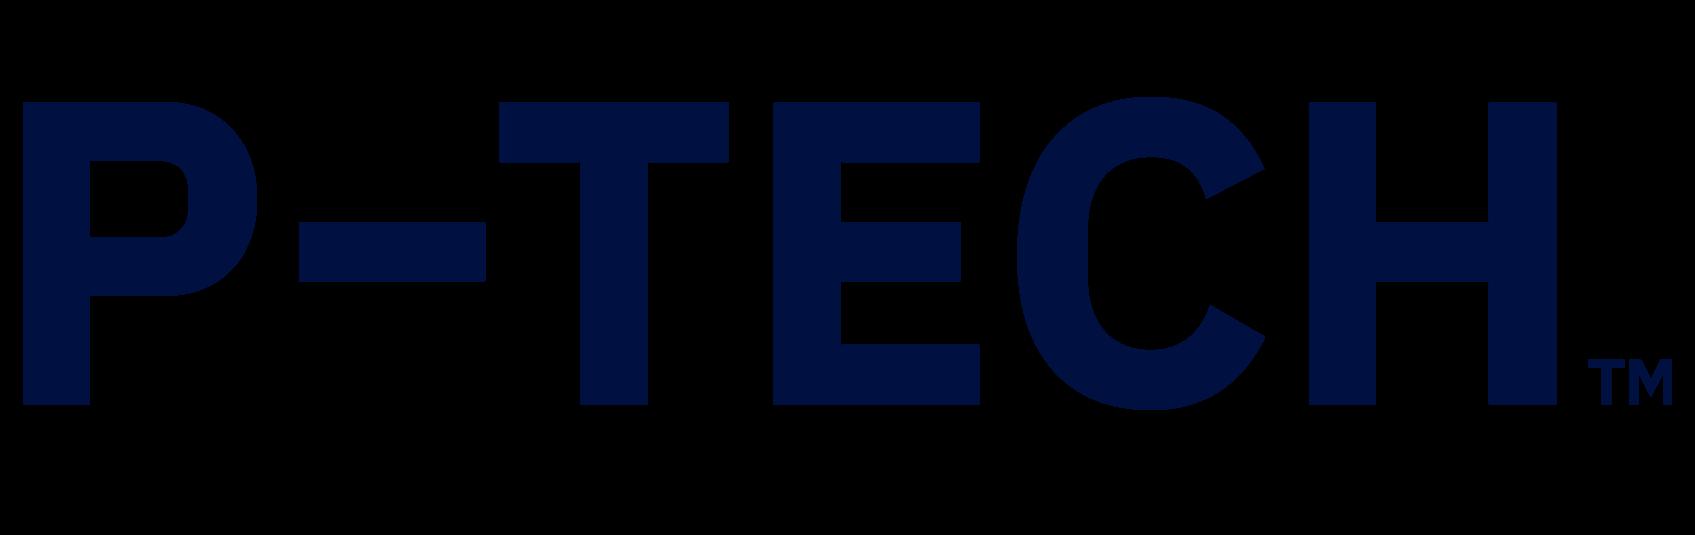 logo_footer_ptech